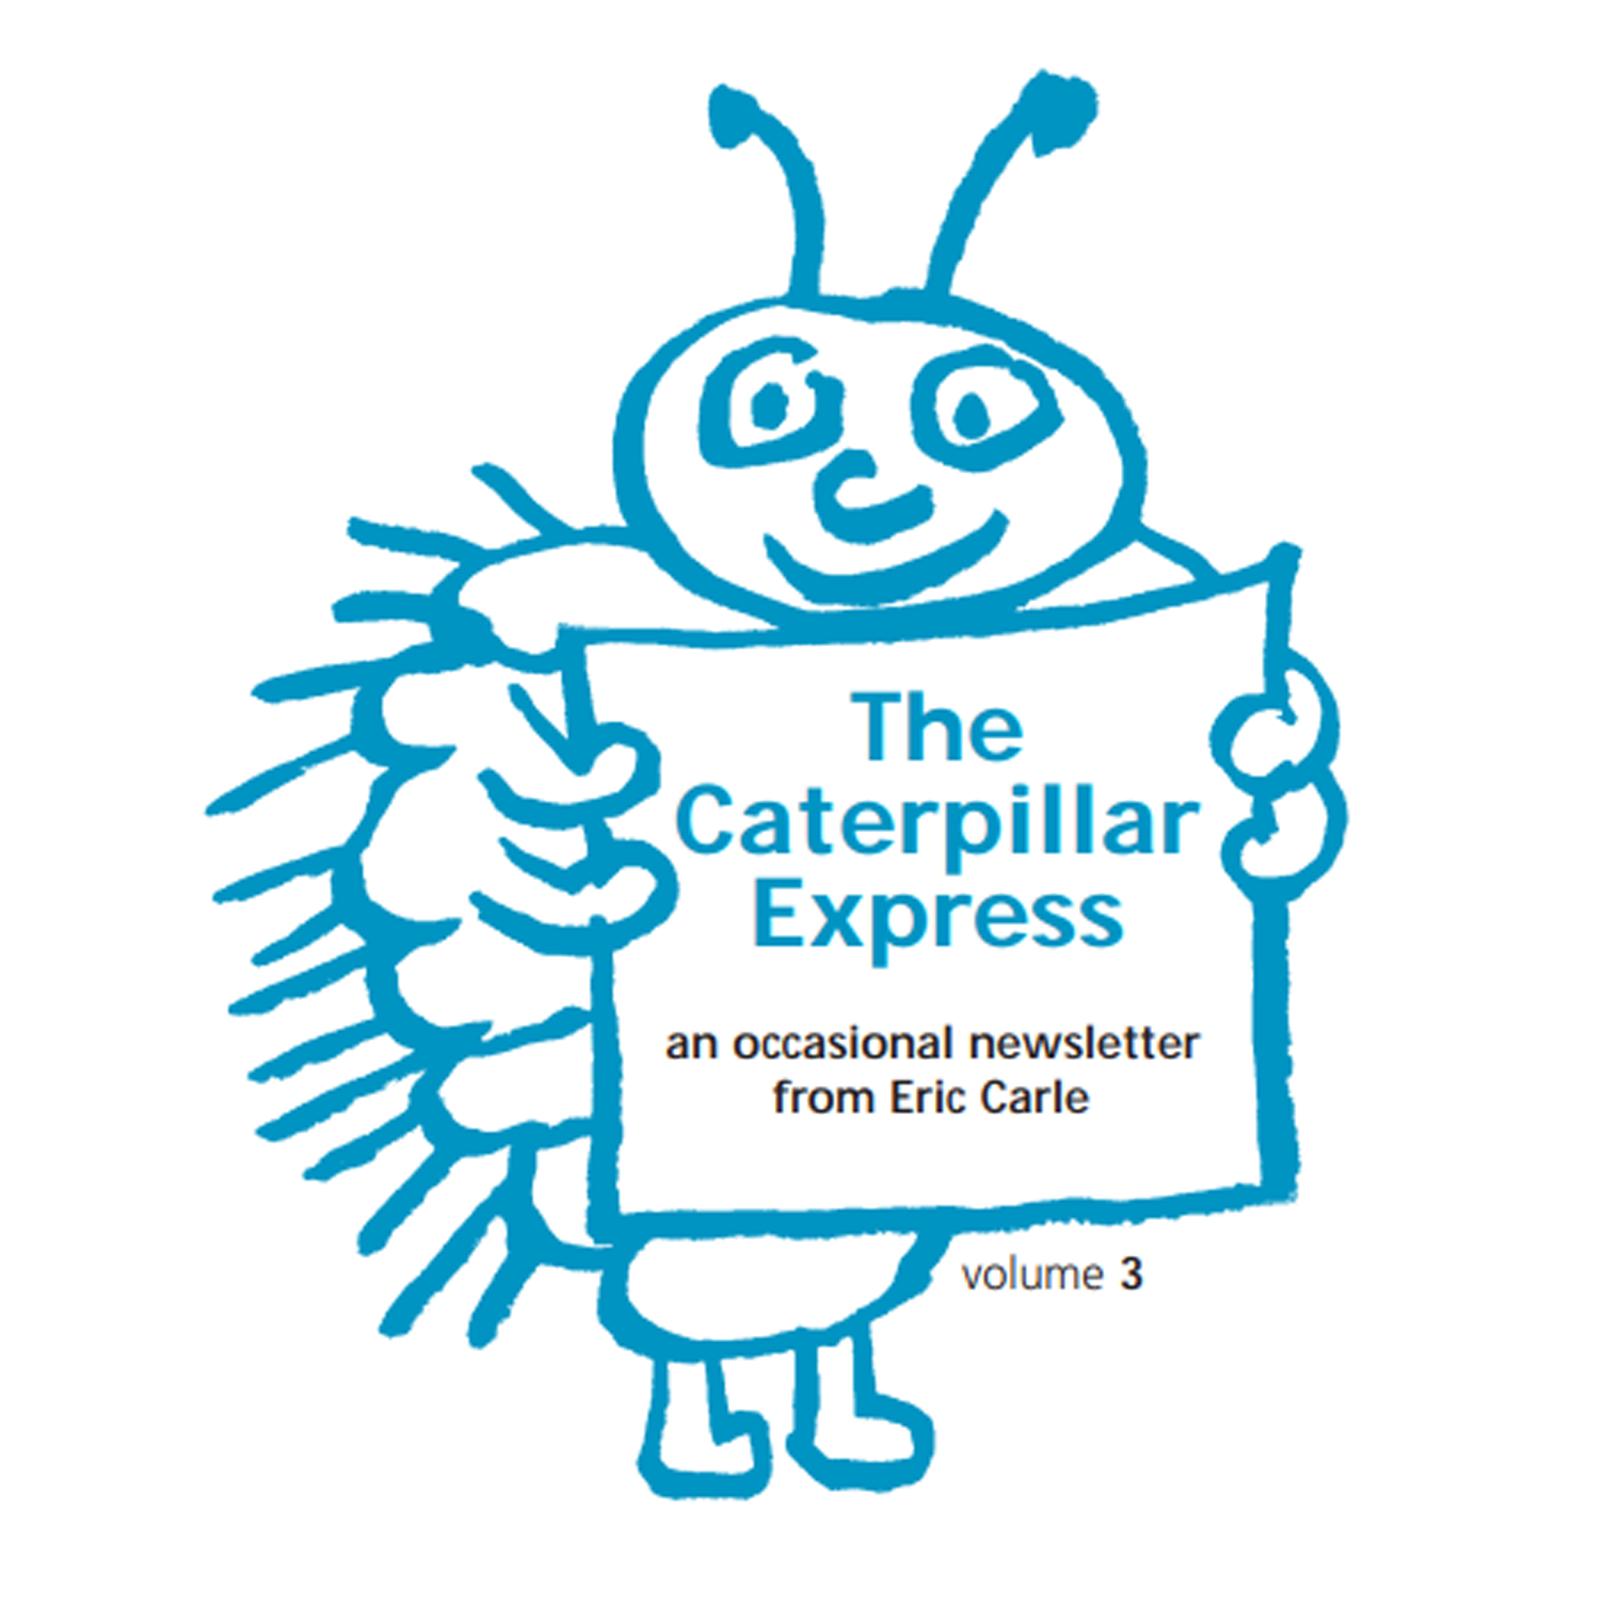 Caterpillar Express Volume 3